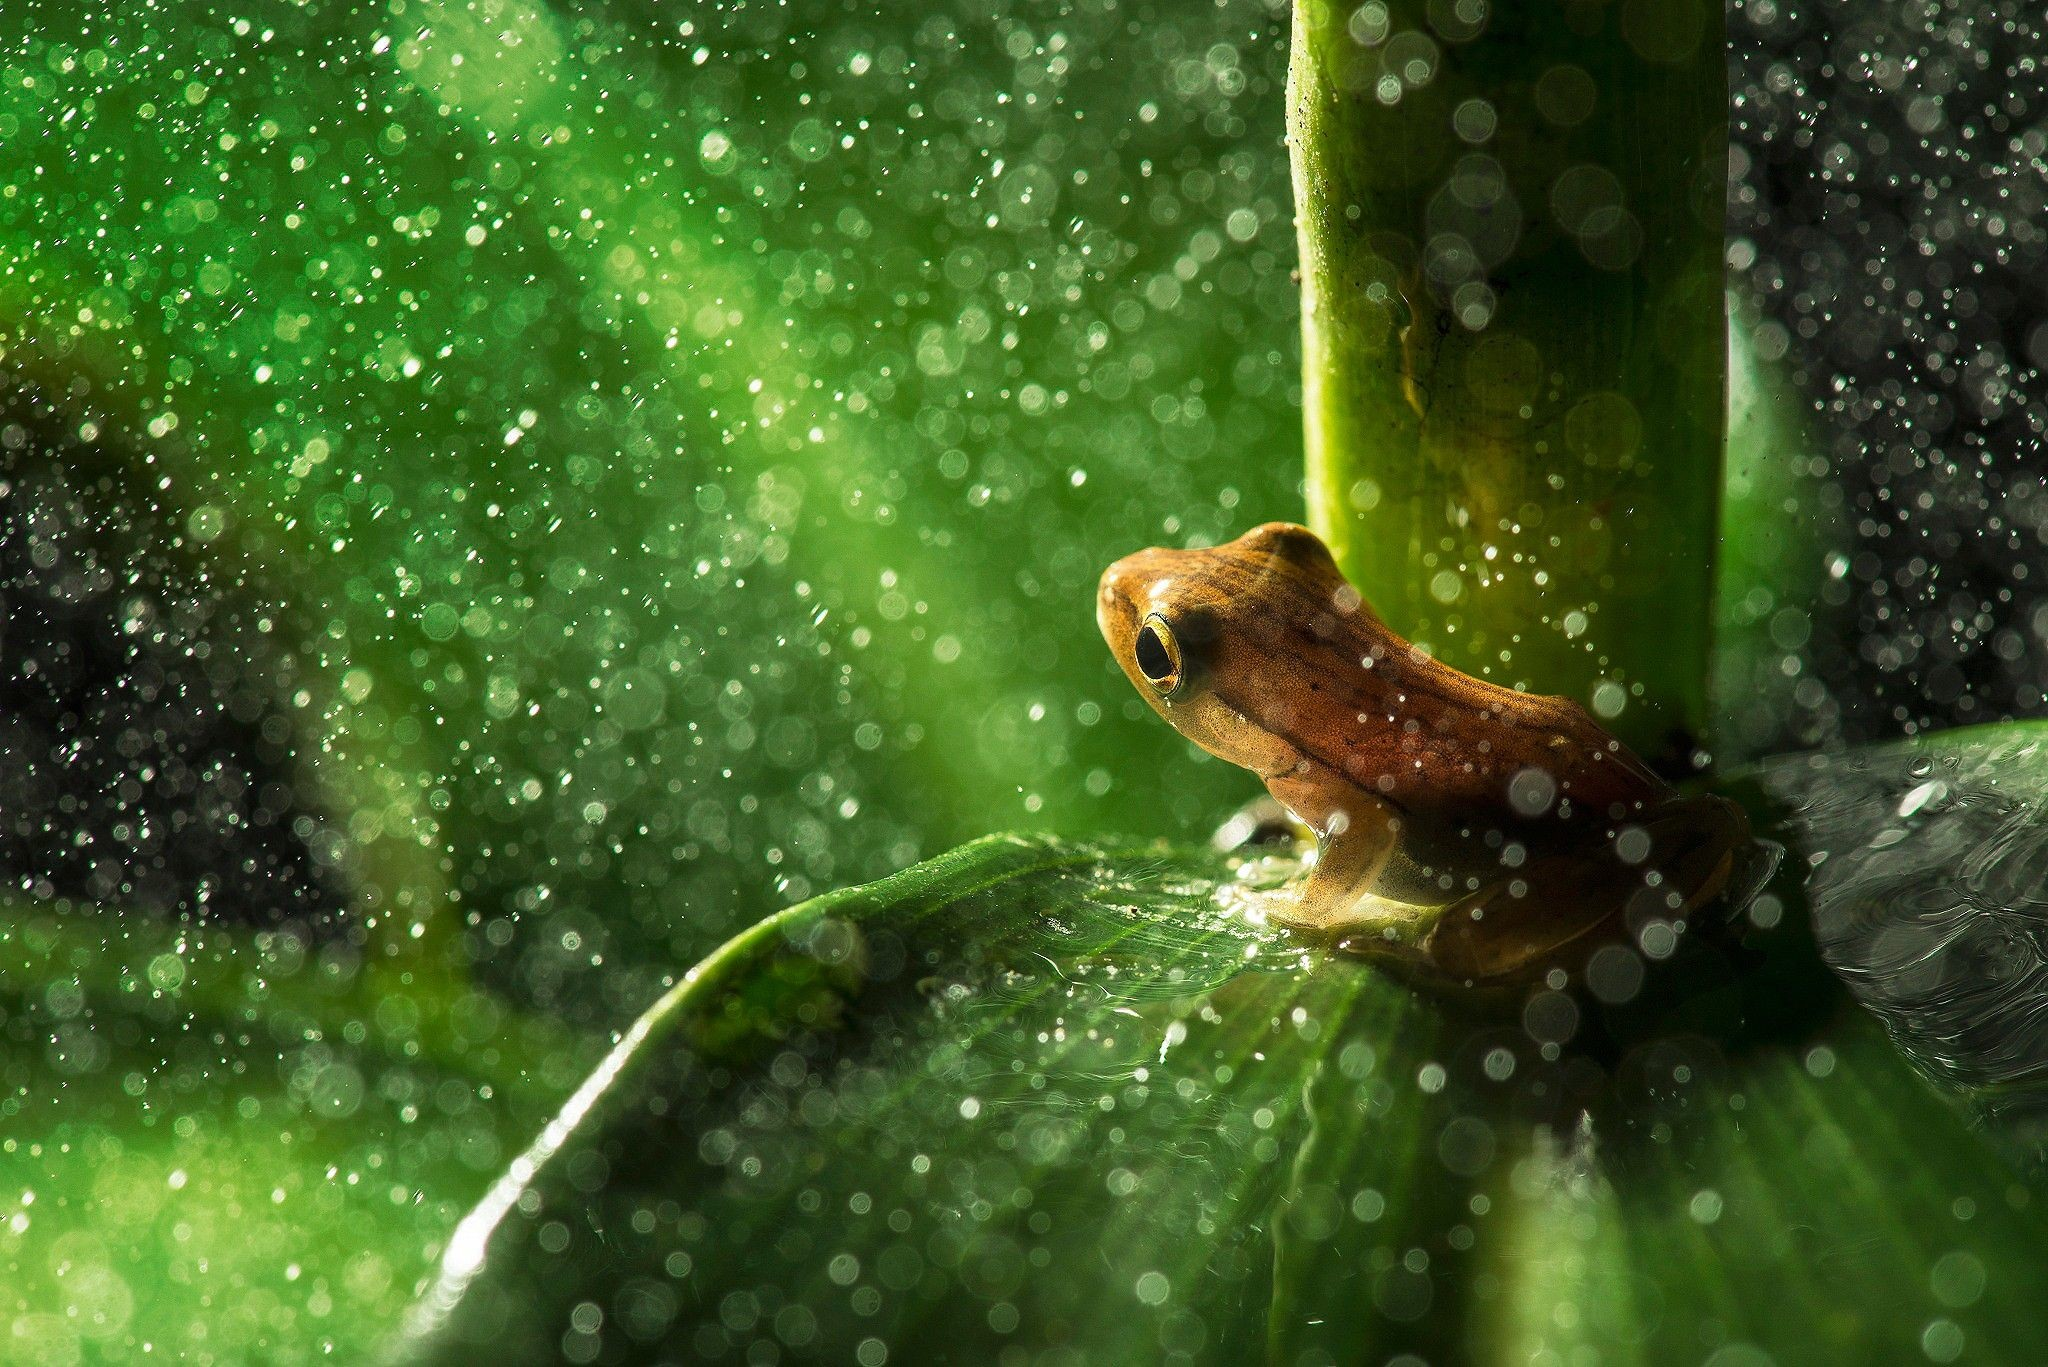 Res: 2048x1367, #nature, #animals, #frogs, #leaves, #macro, #rain, #water drops, #plants |  Wallpaper No. 165978 - wallhaven.cc